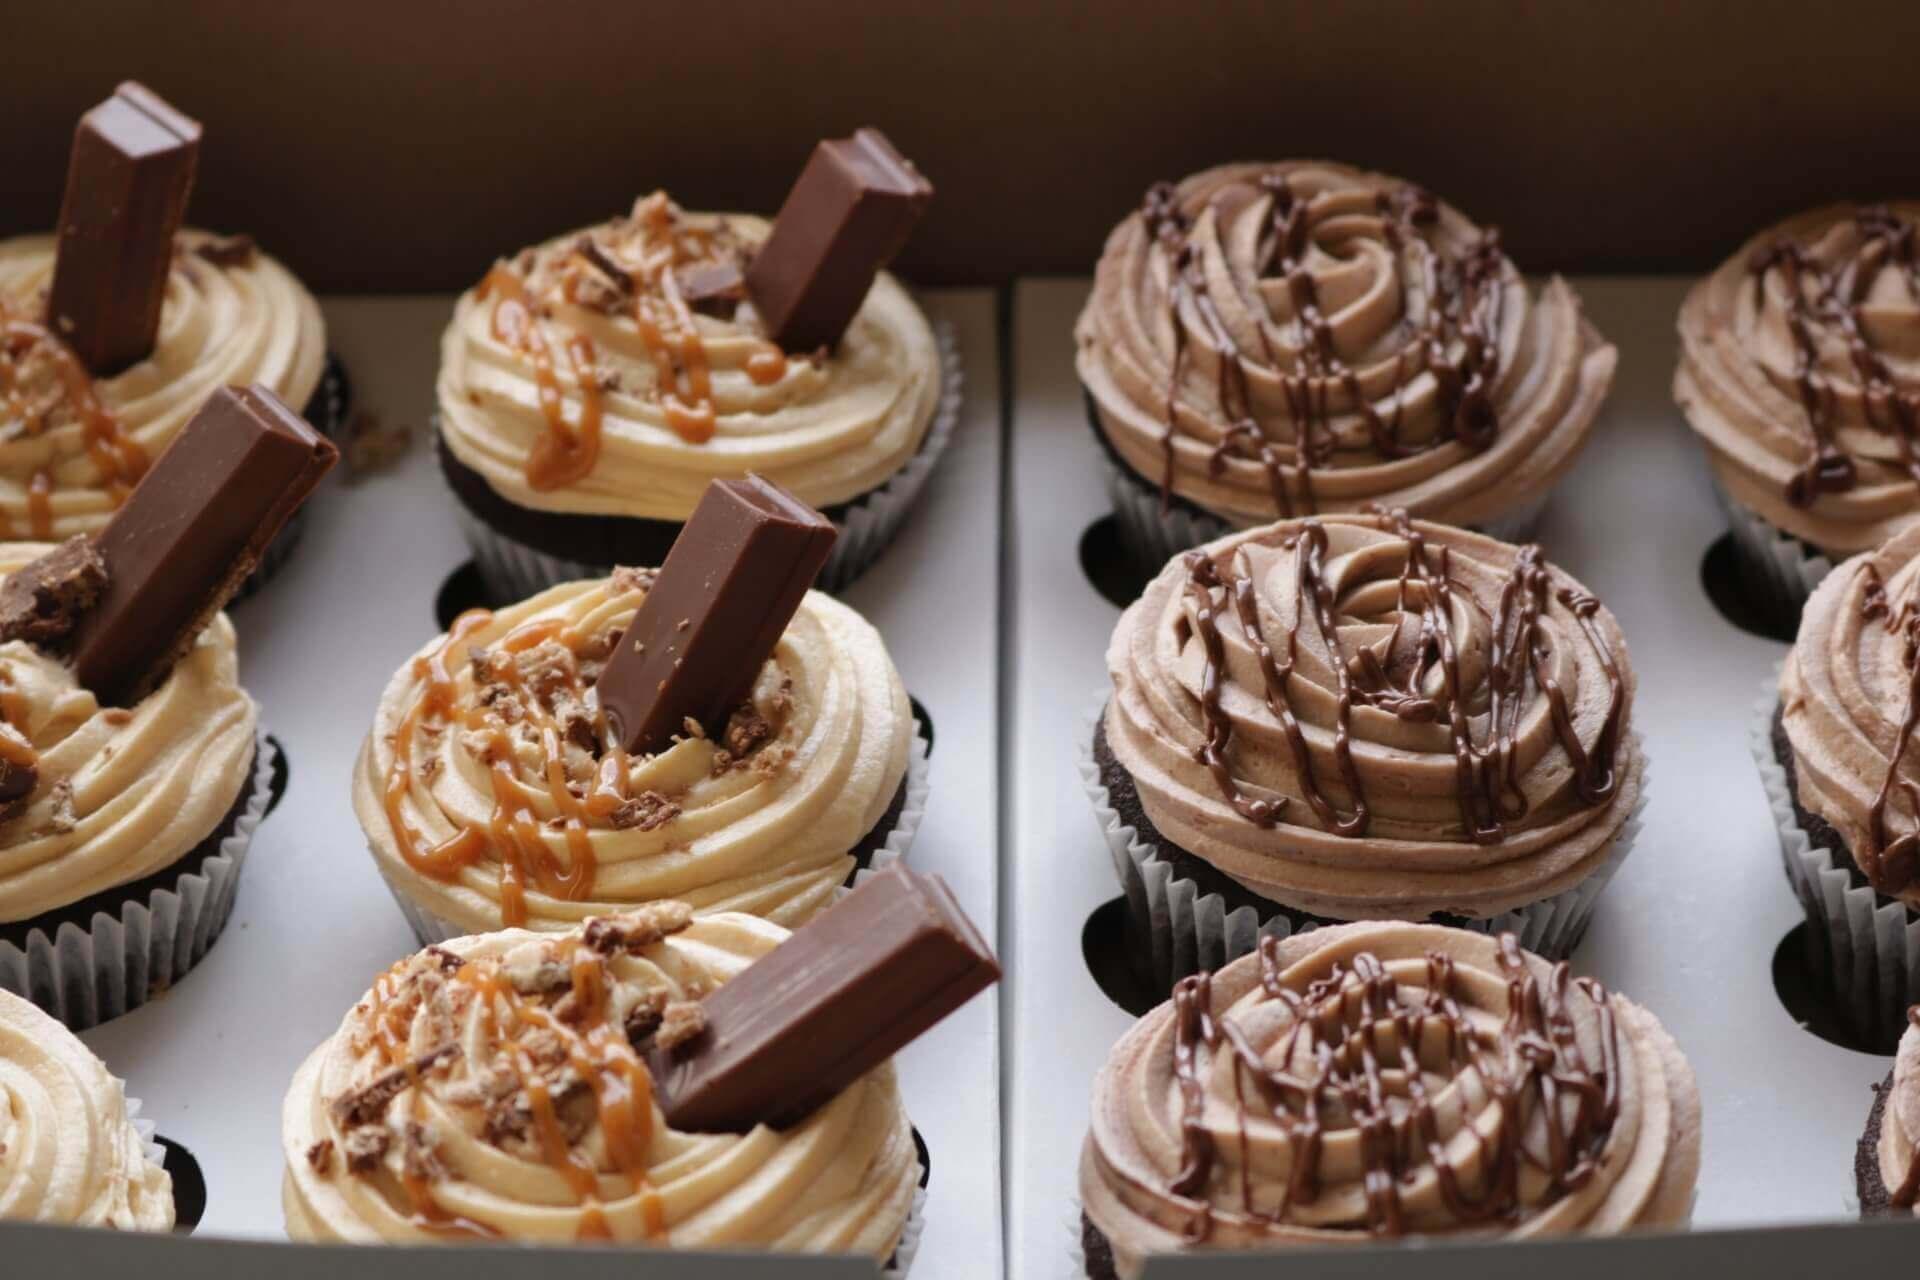 Kit-Kat Cupcakes